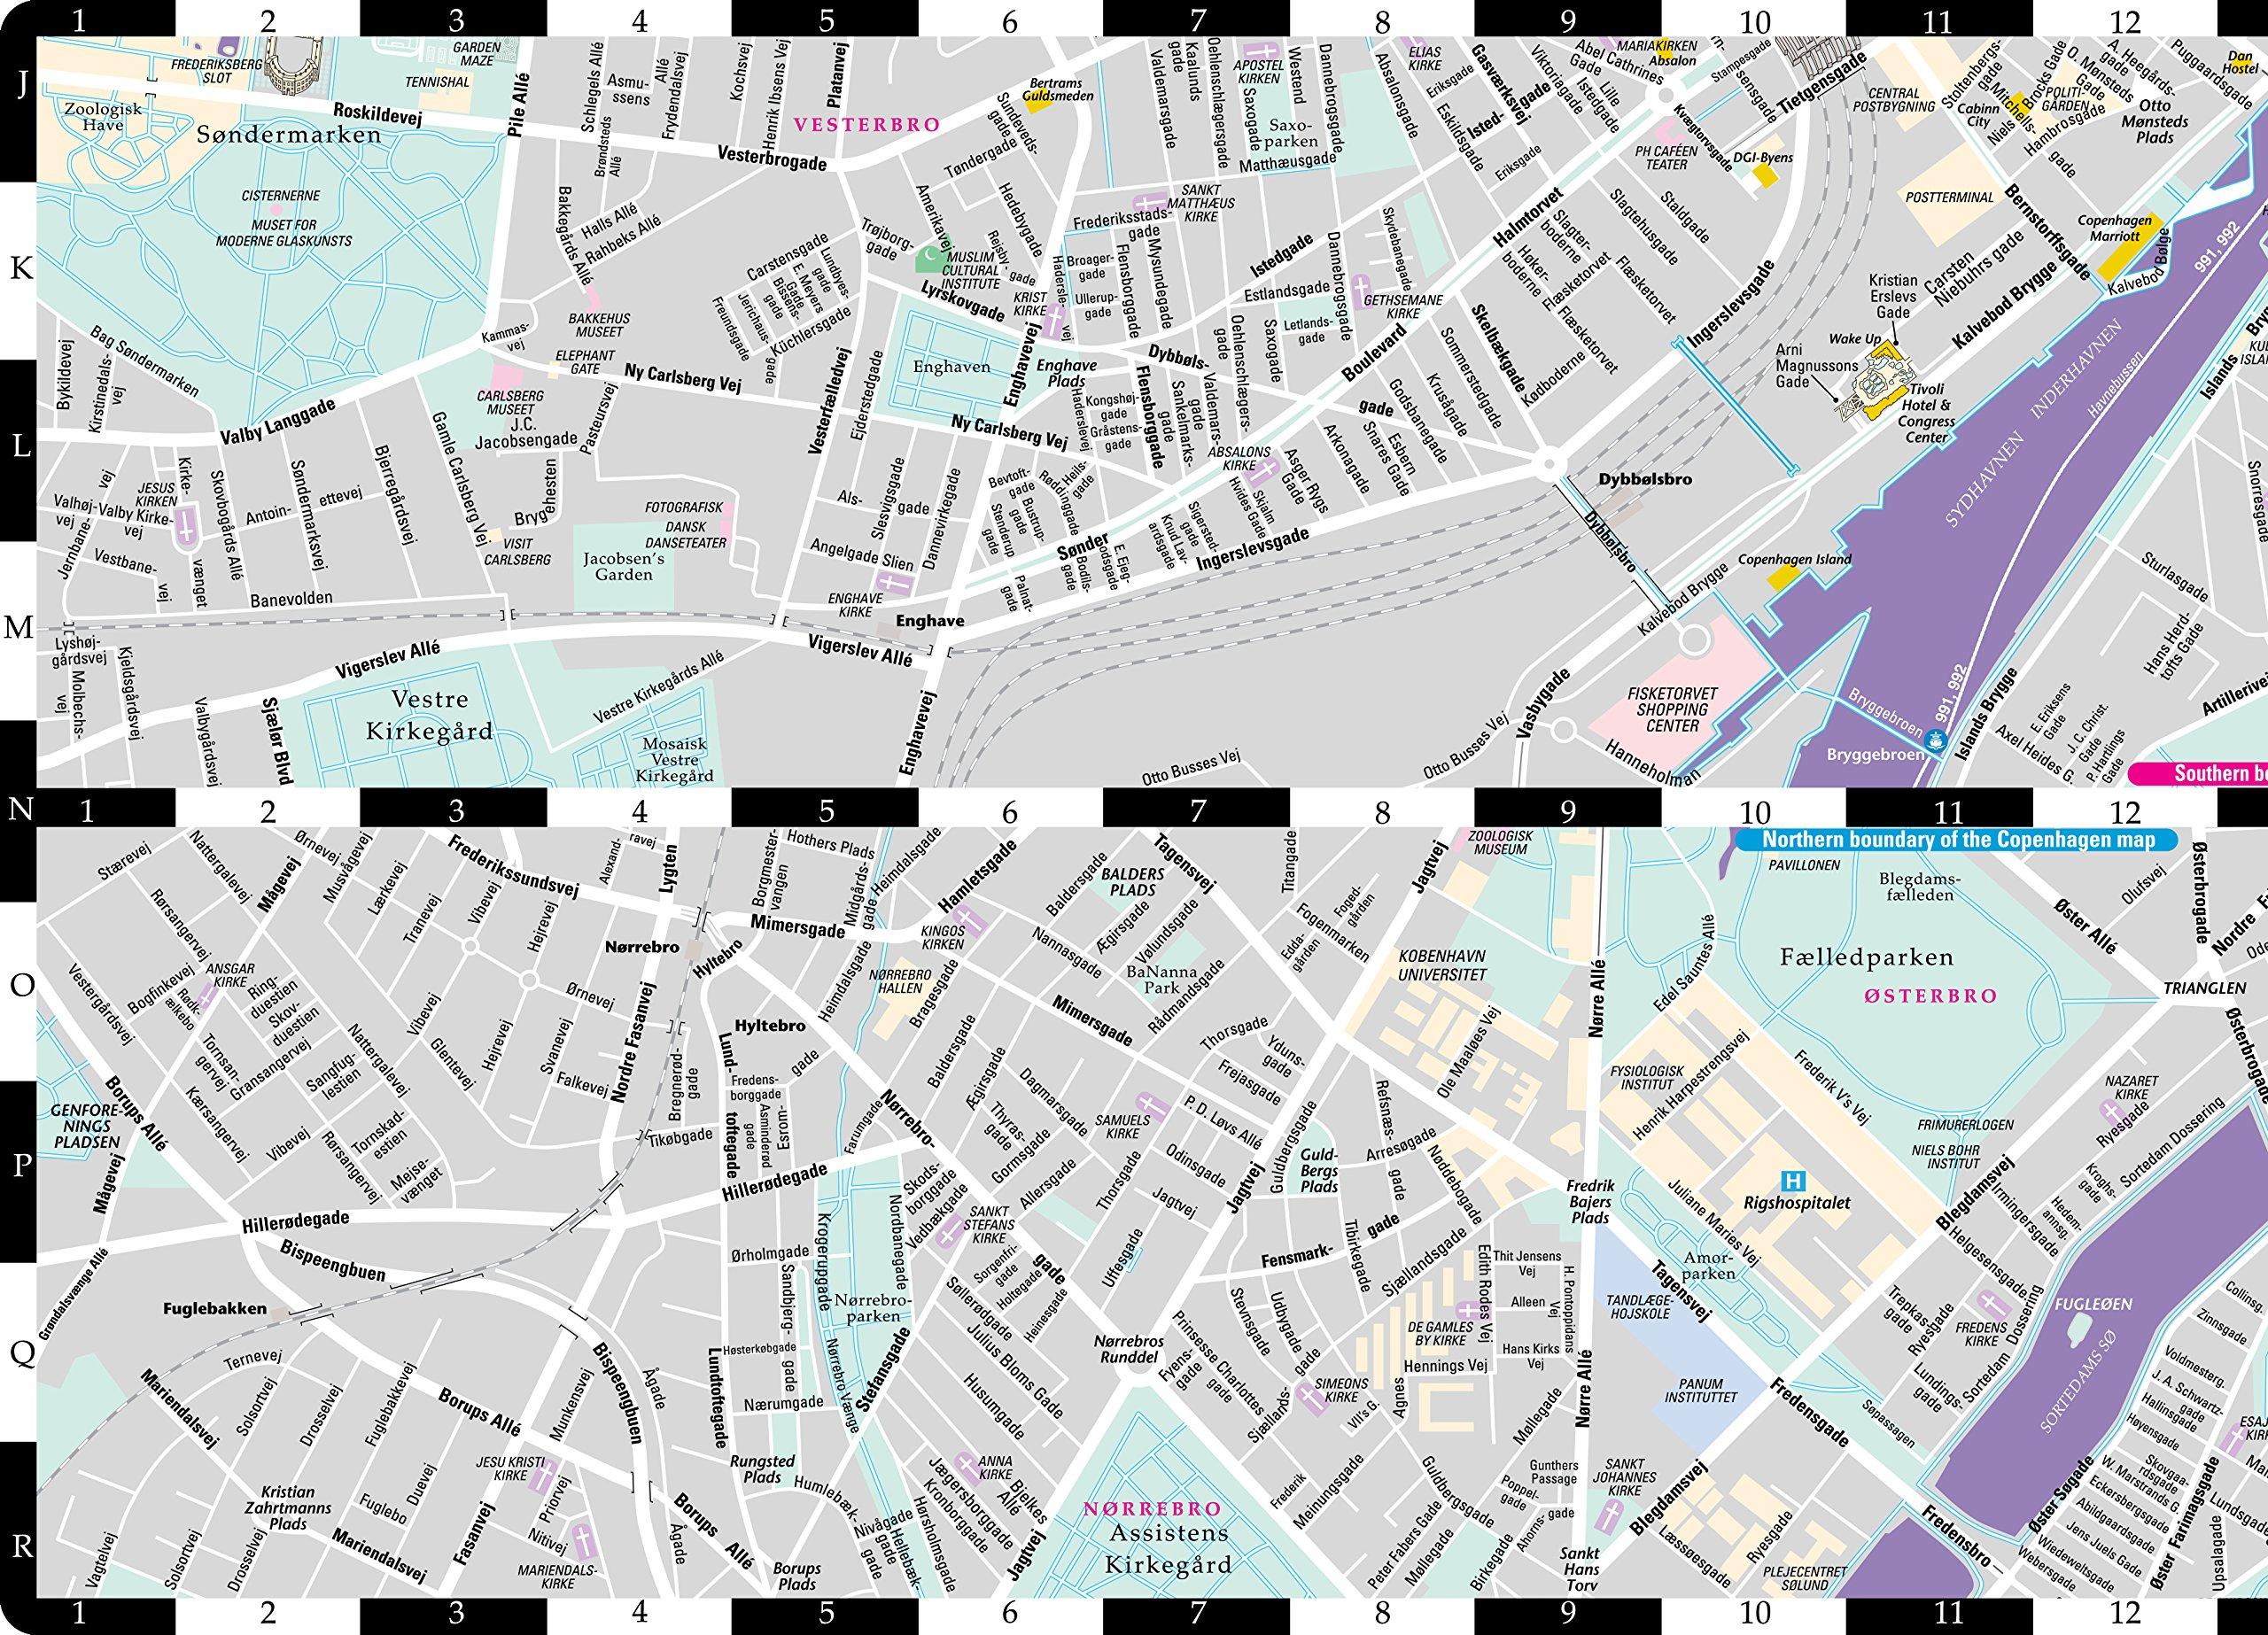 Streetwise Copenhagen Map Laminated City Center Street Map of